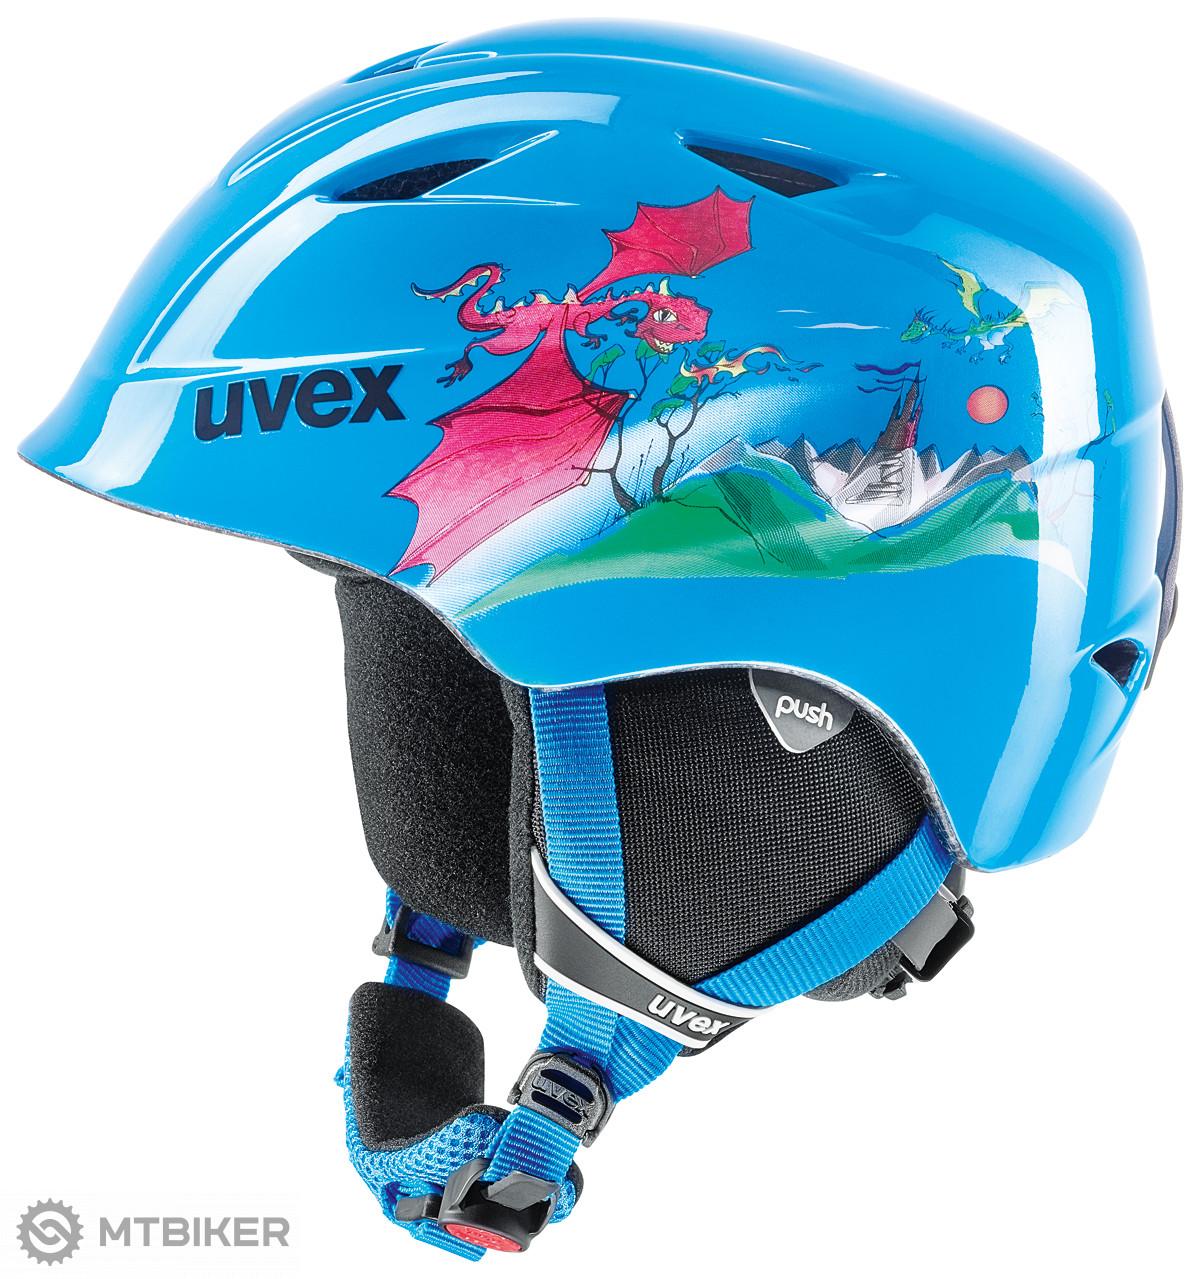 UVEX Airwing 2 Blue Dragon lyžiarska prilba detská - MTBIKER Shop 56514c117ba